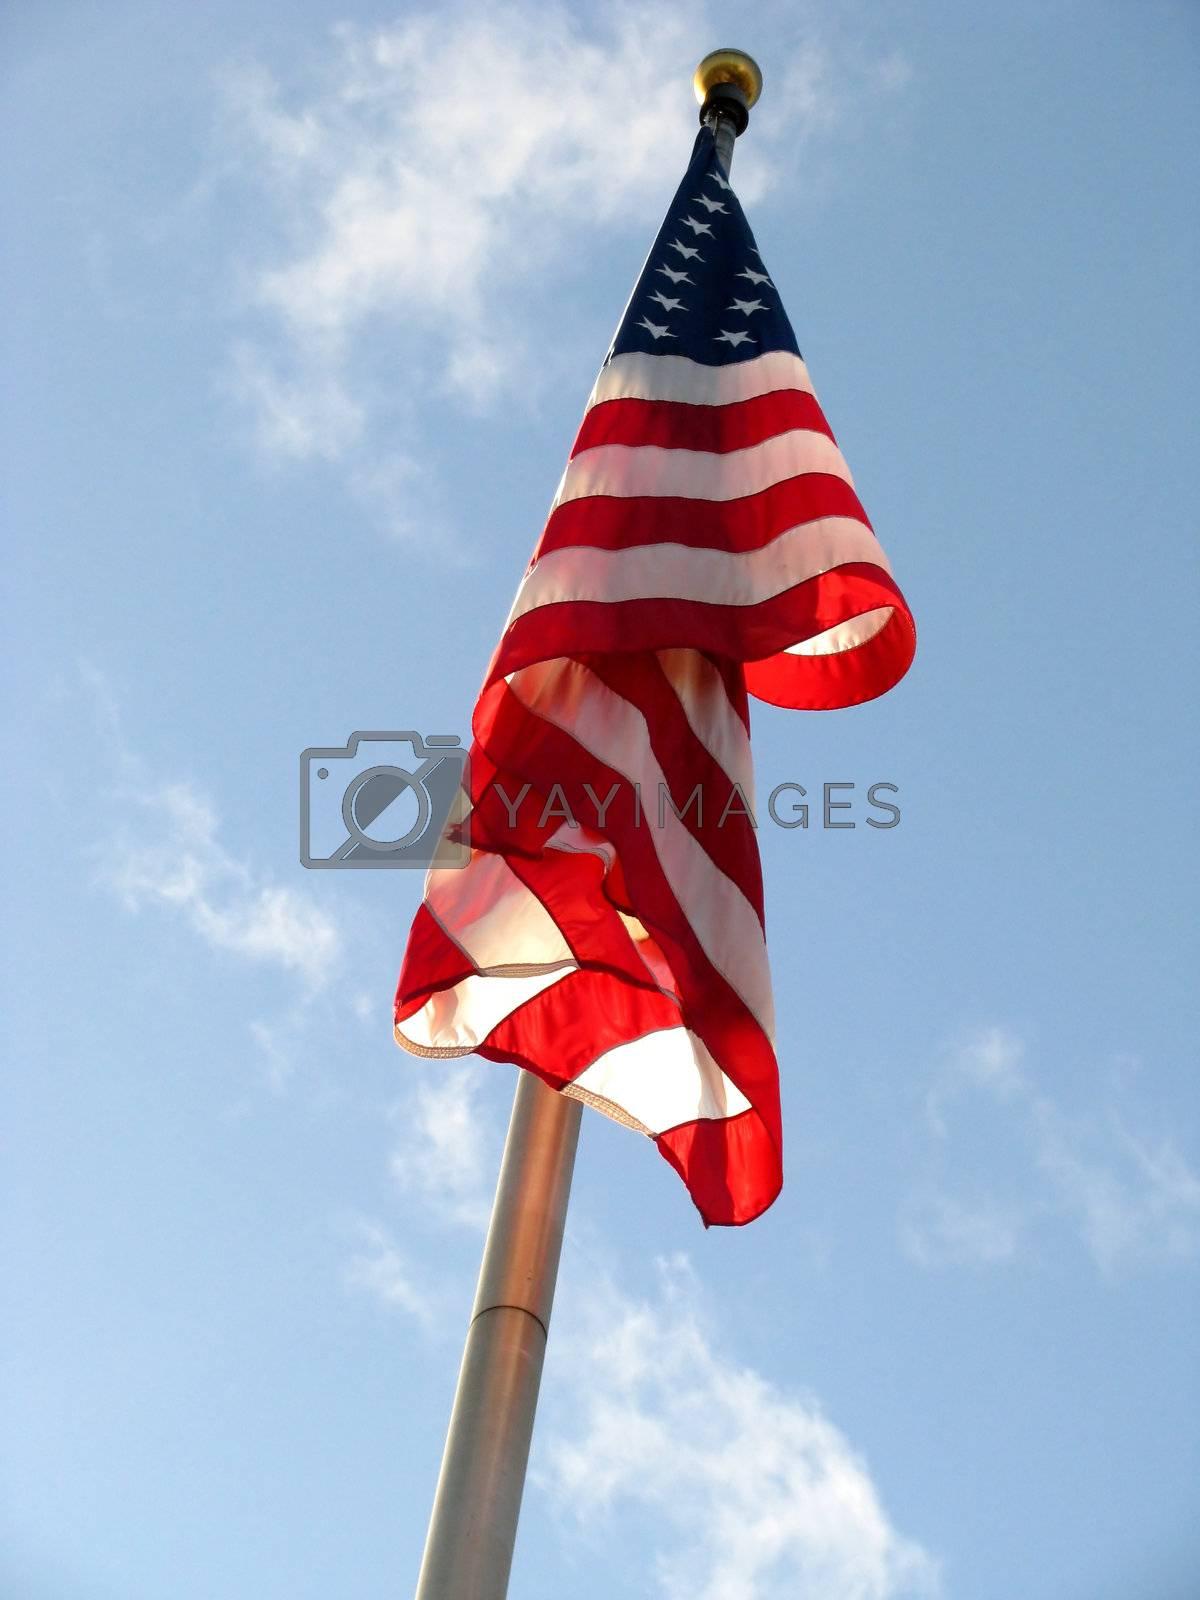 American Flag v2 by mwp1969